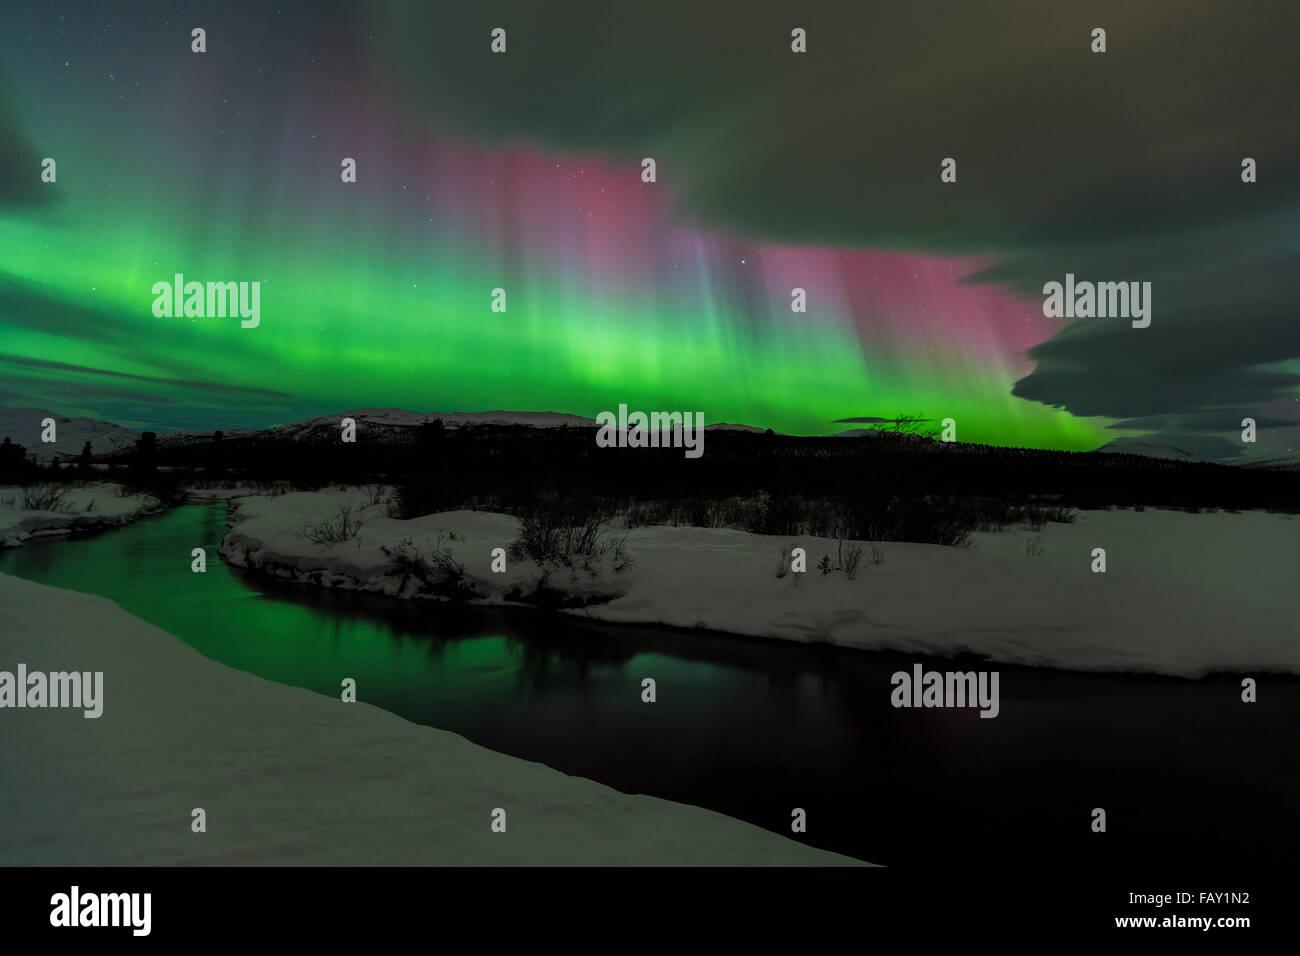 Barrow Alaska Northern Lights